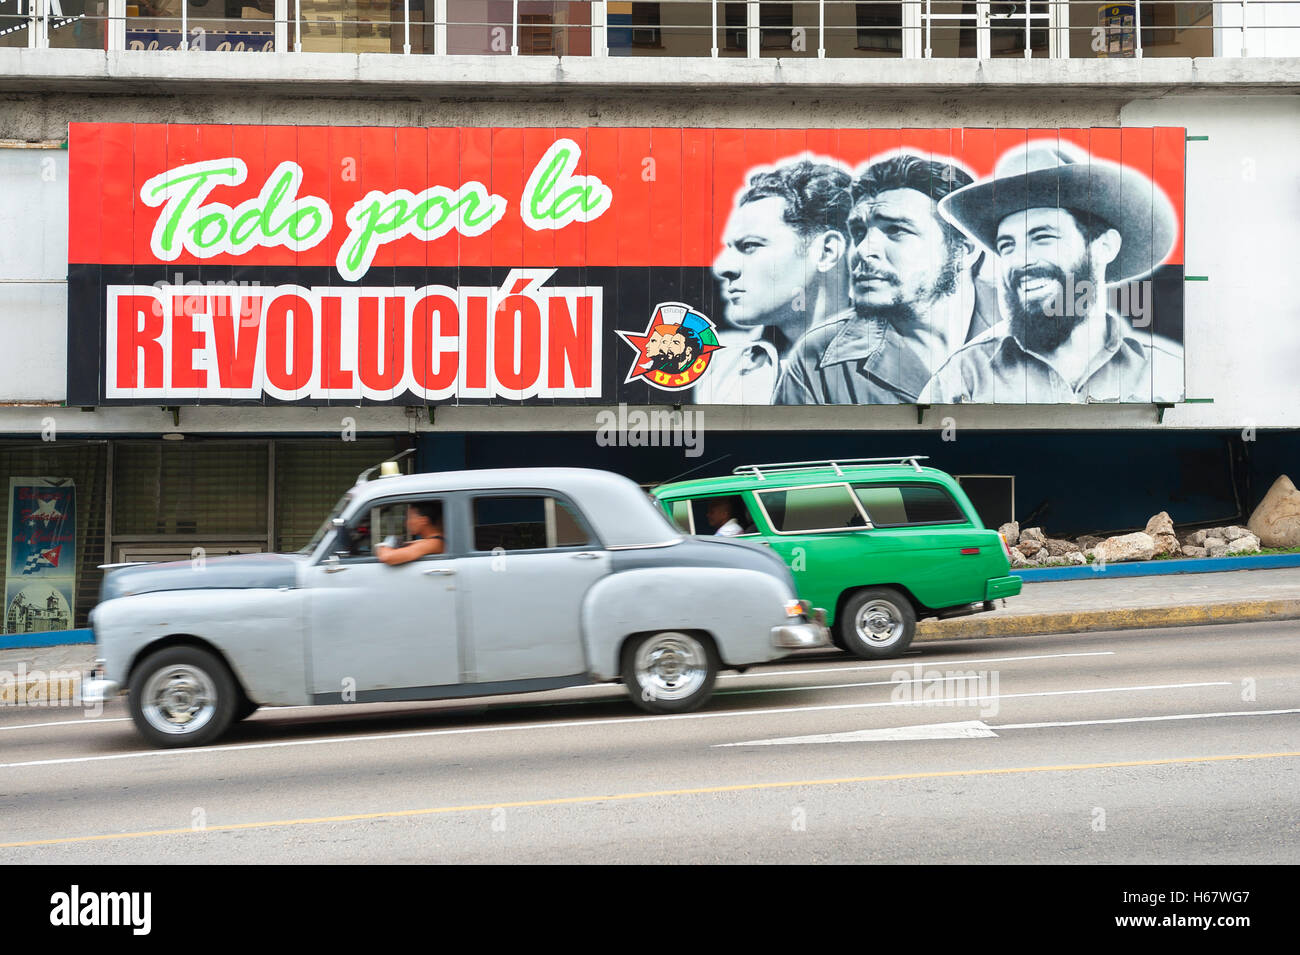 HAVANA - JUNE 13, 2011: Vintage American taxi cars pass below billboard promoting Communist propaganda in La Rampa. - Stock Image